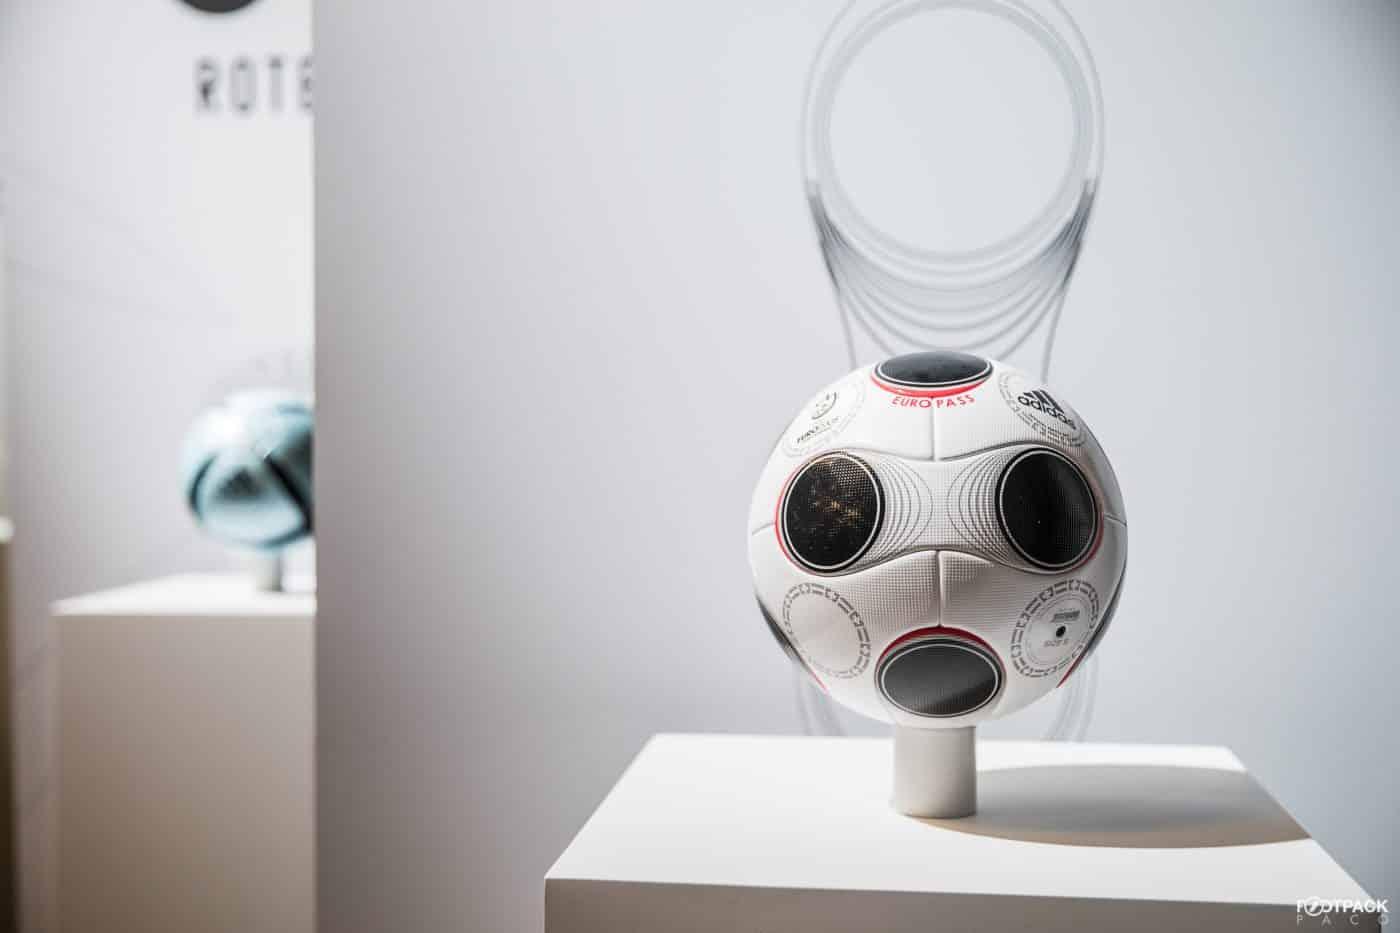 ballon-football-adidas-euro-2008-footpack-2019-2